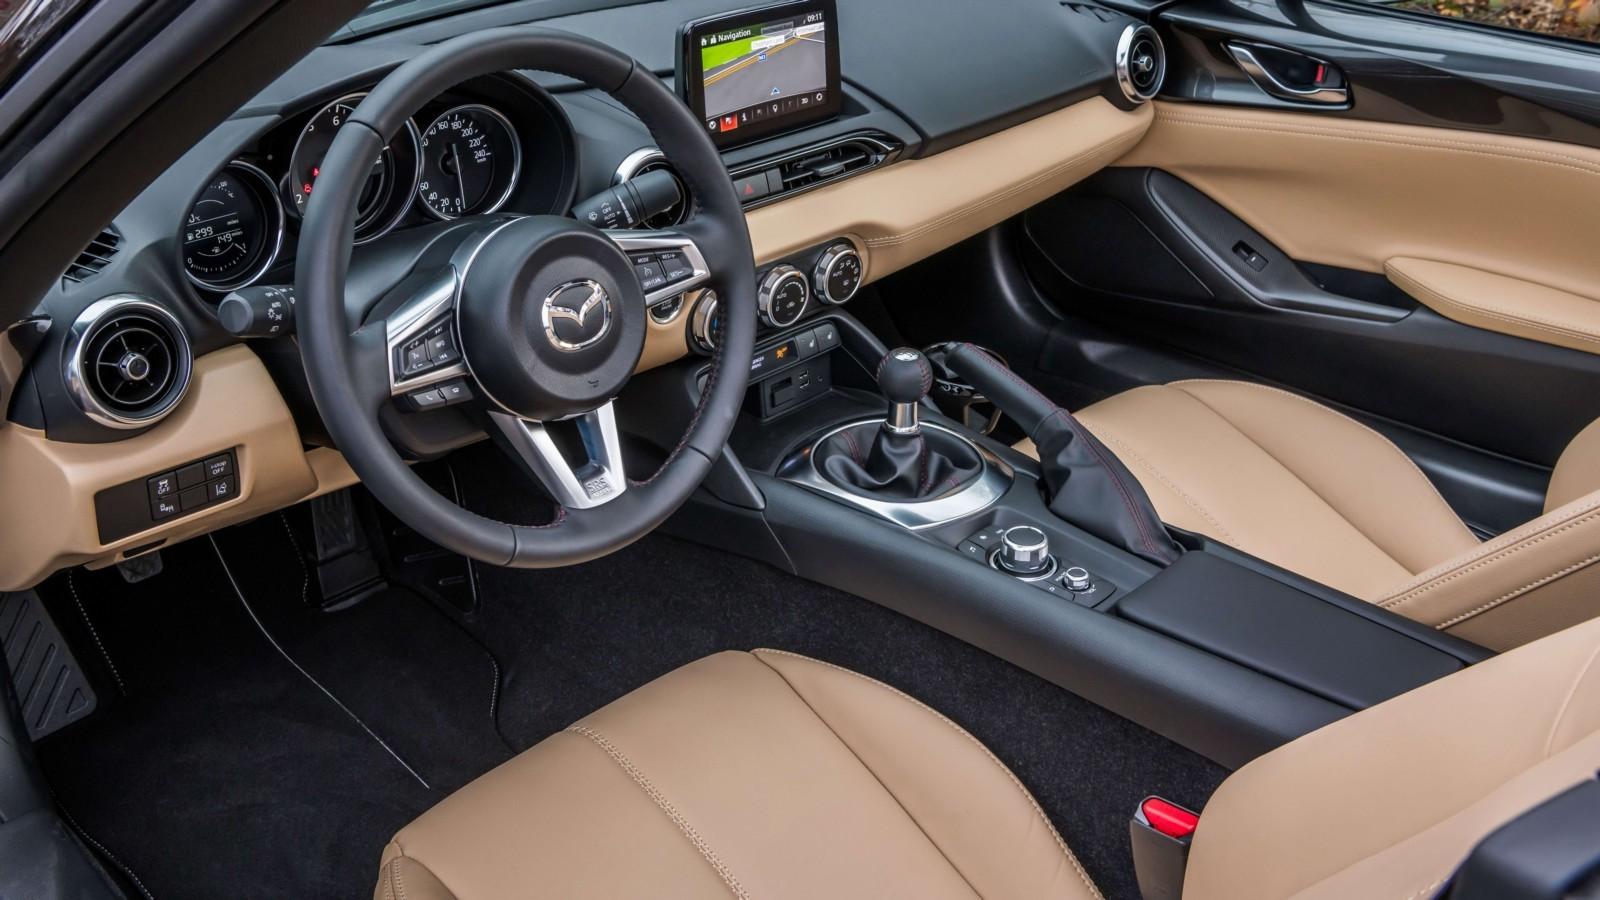 Родстер Мазда MX-5 выйдет вспортивной версии Z